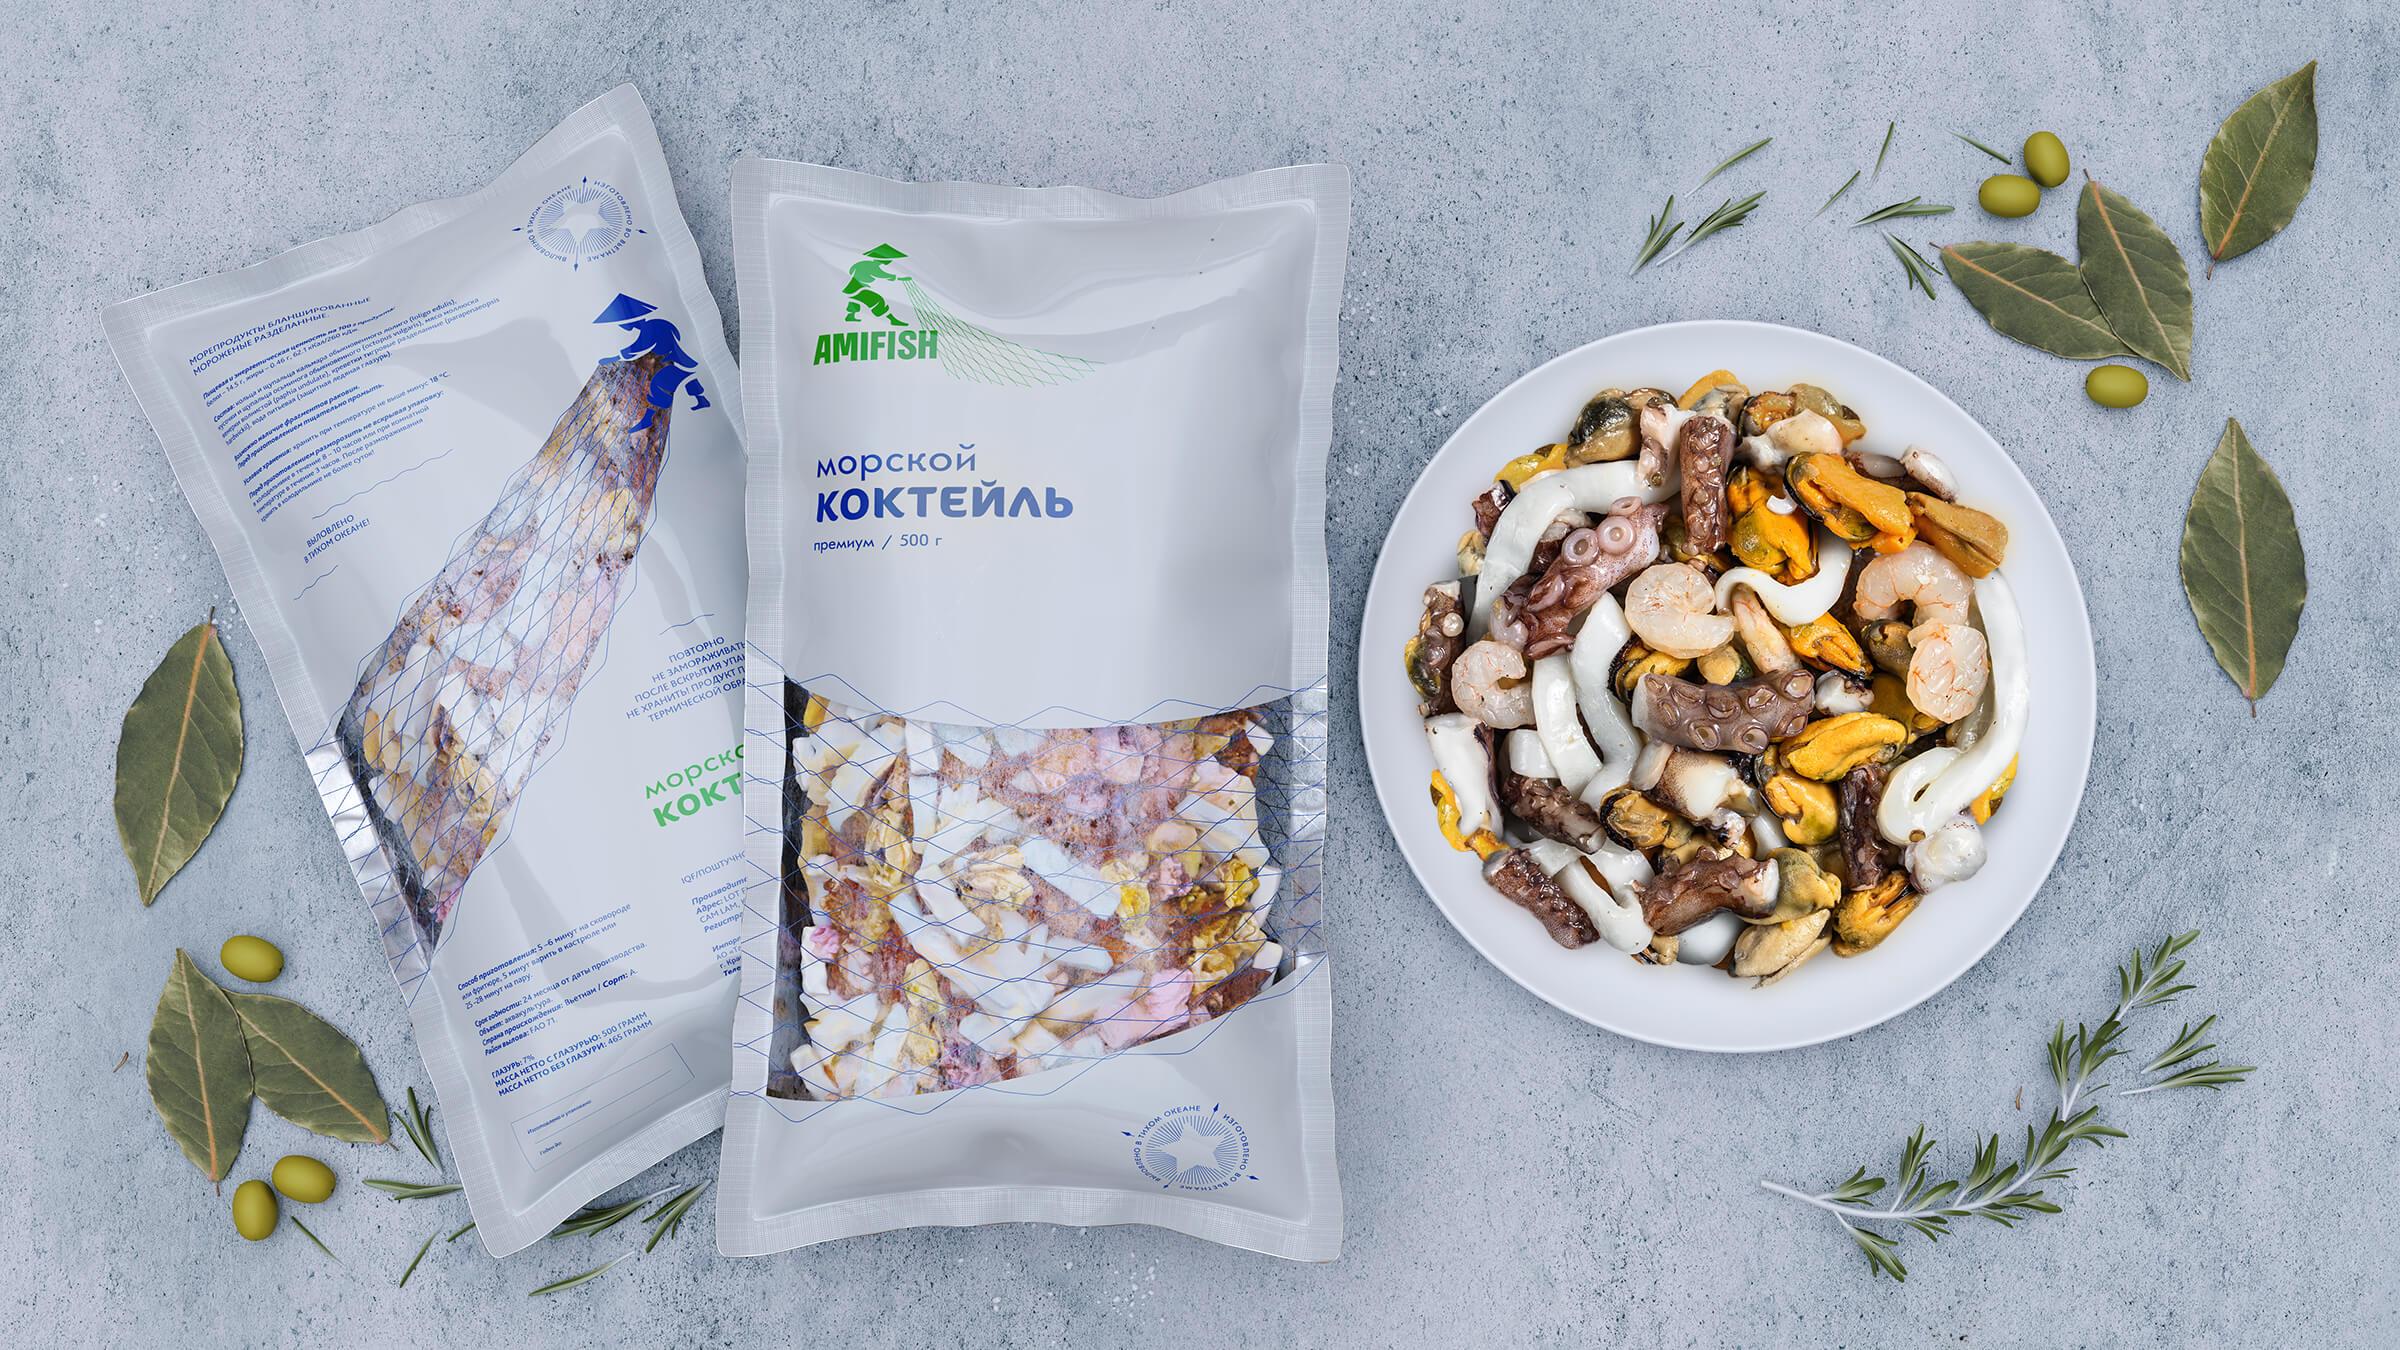 Uniqorn Create Vietnam Sea Food Brand Packaging Design